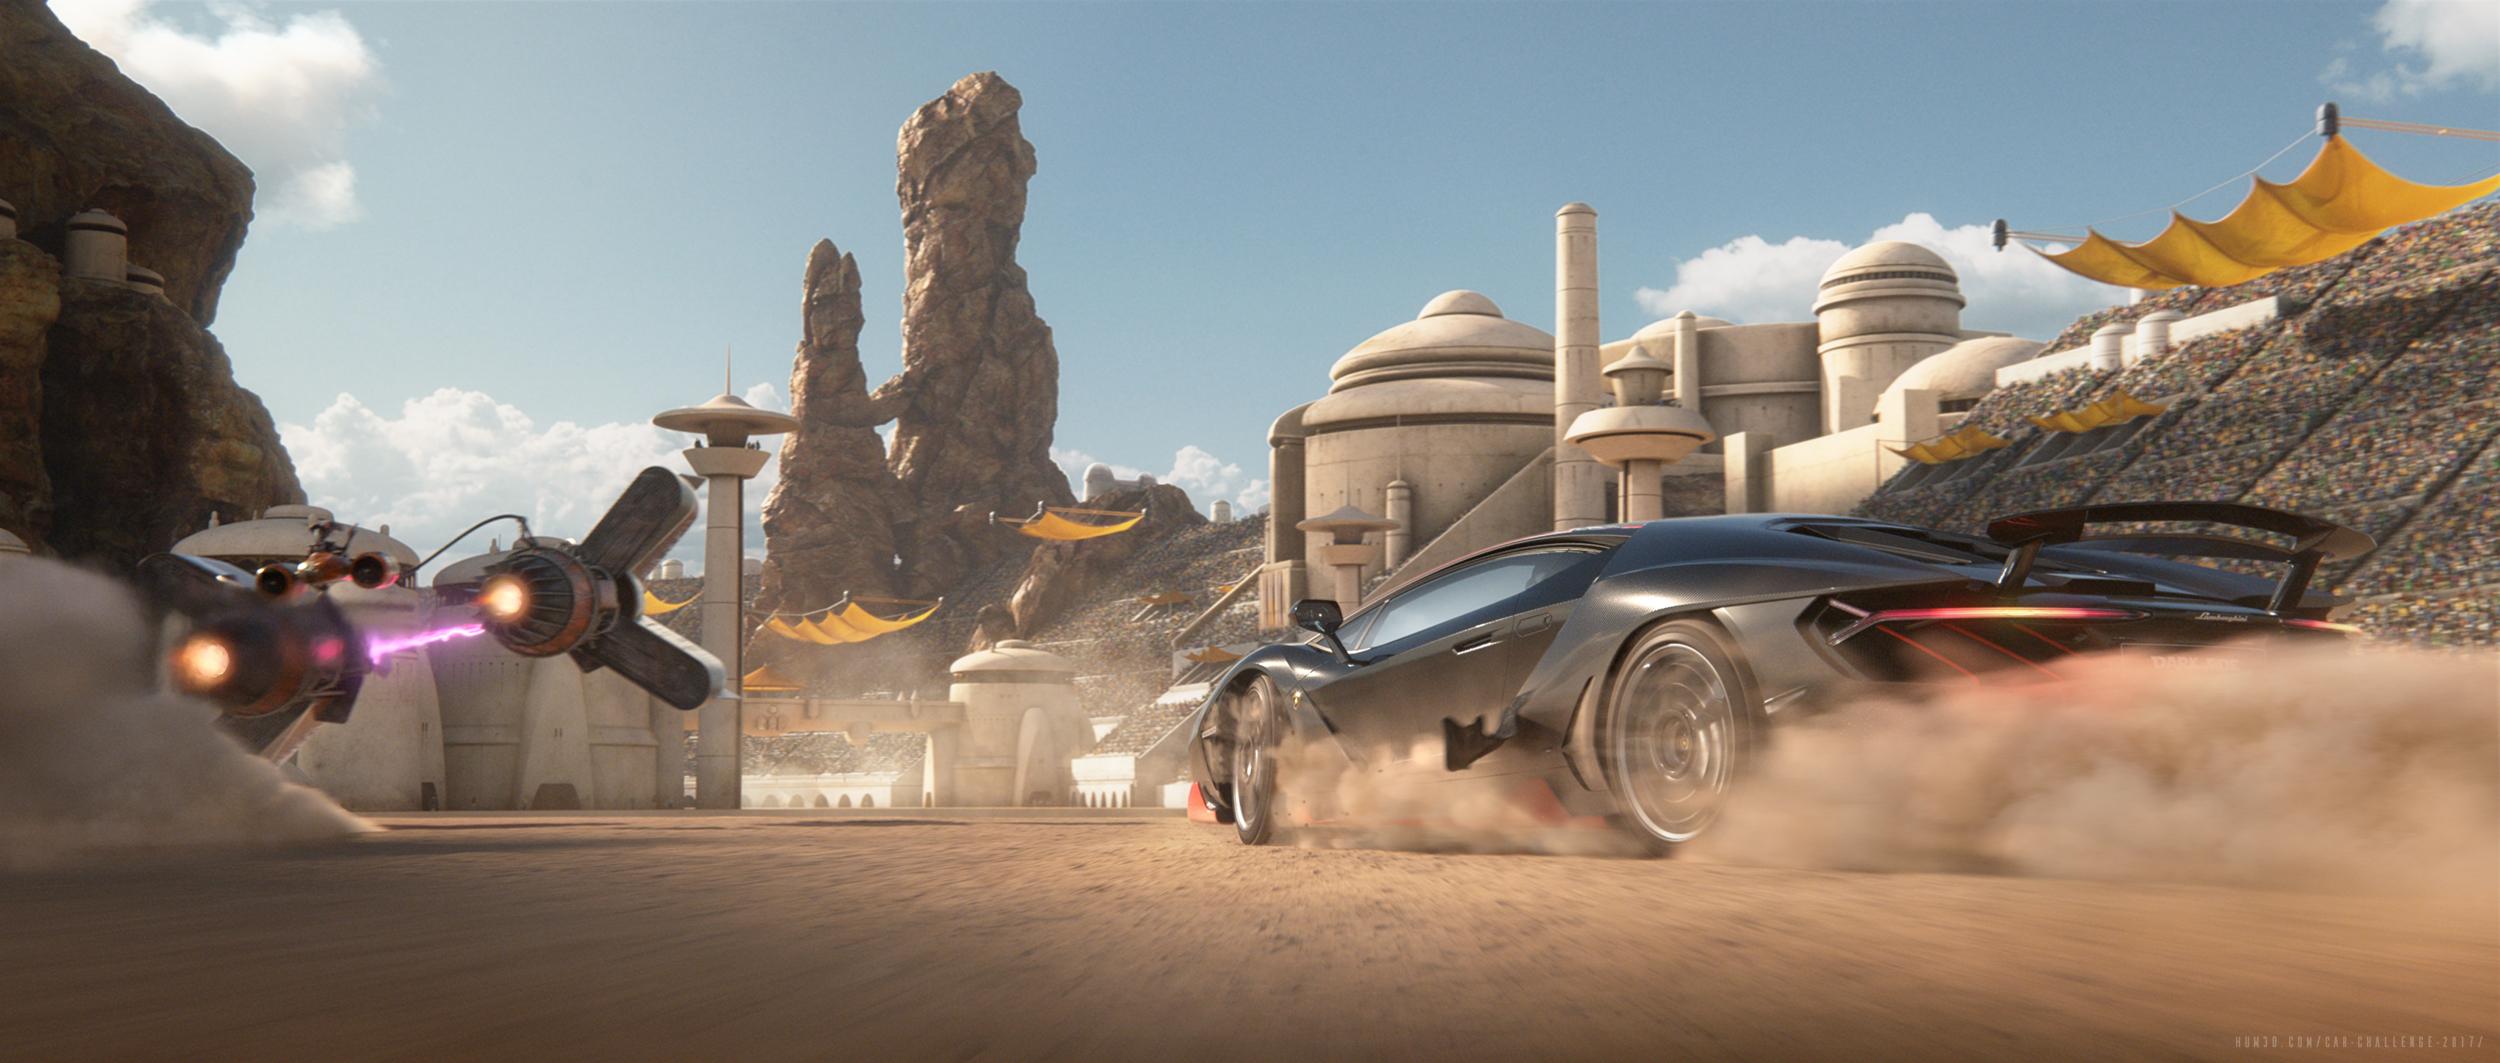 Return to Tatooine 3d art